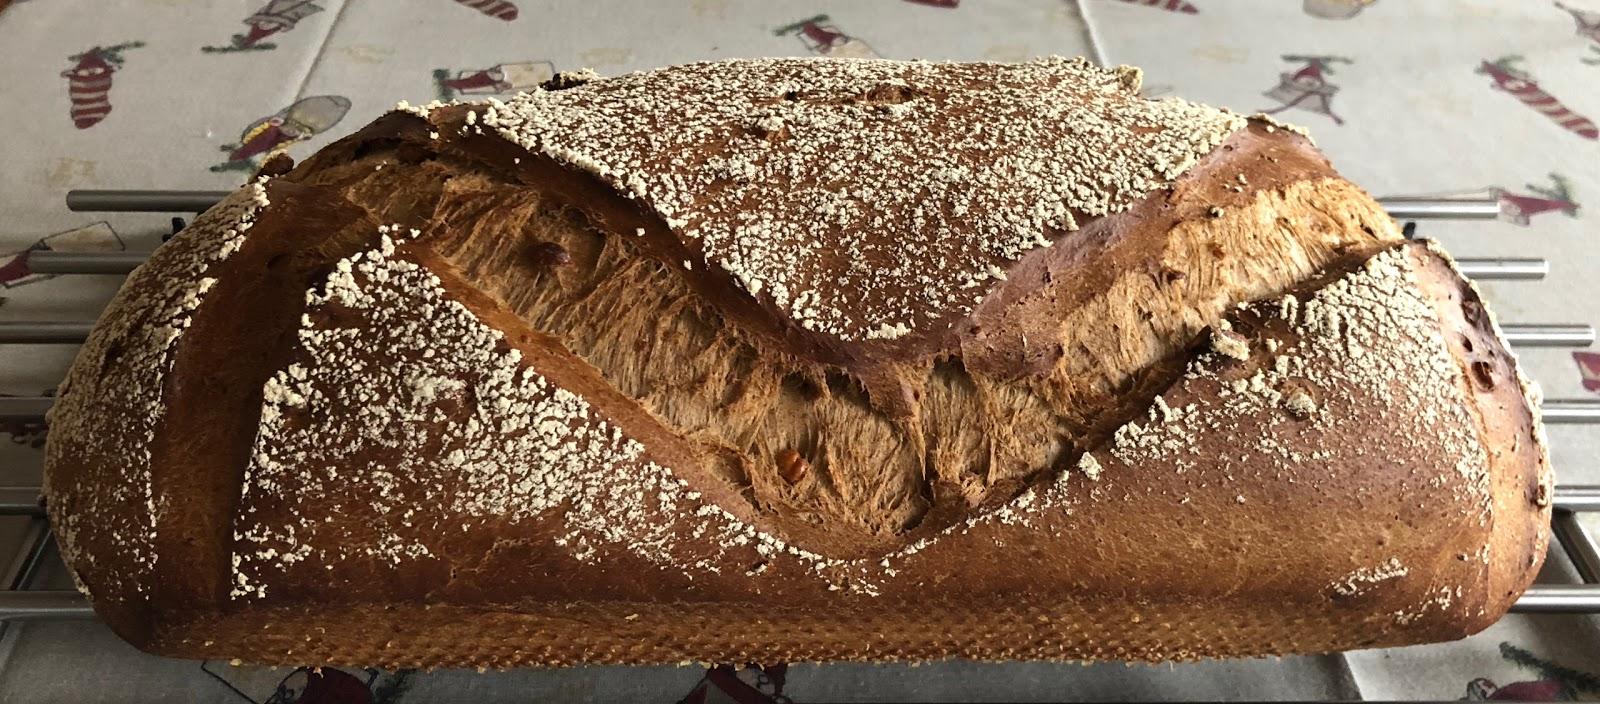 Hornbek Valnødde Brød